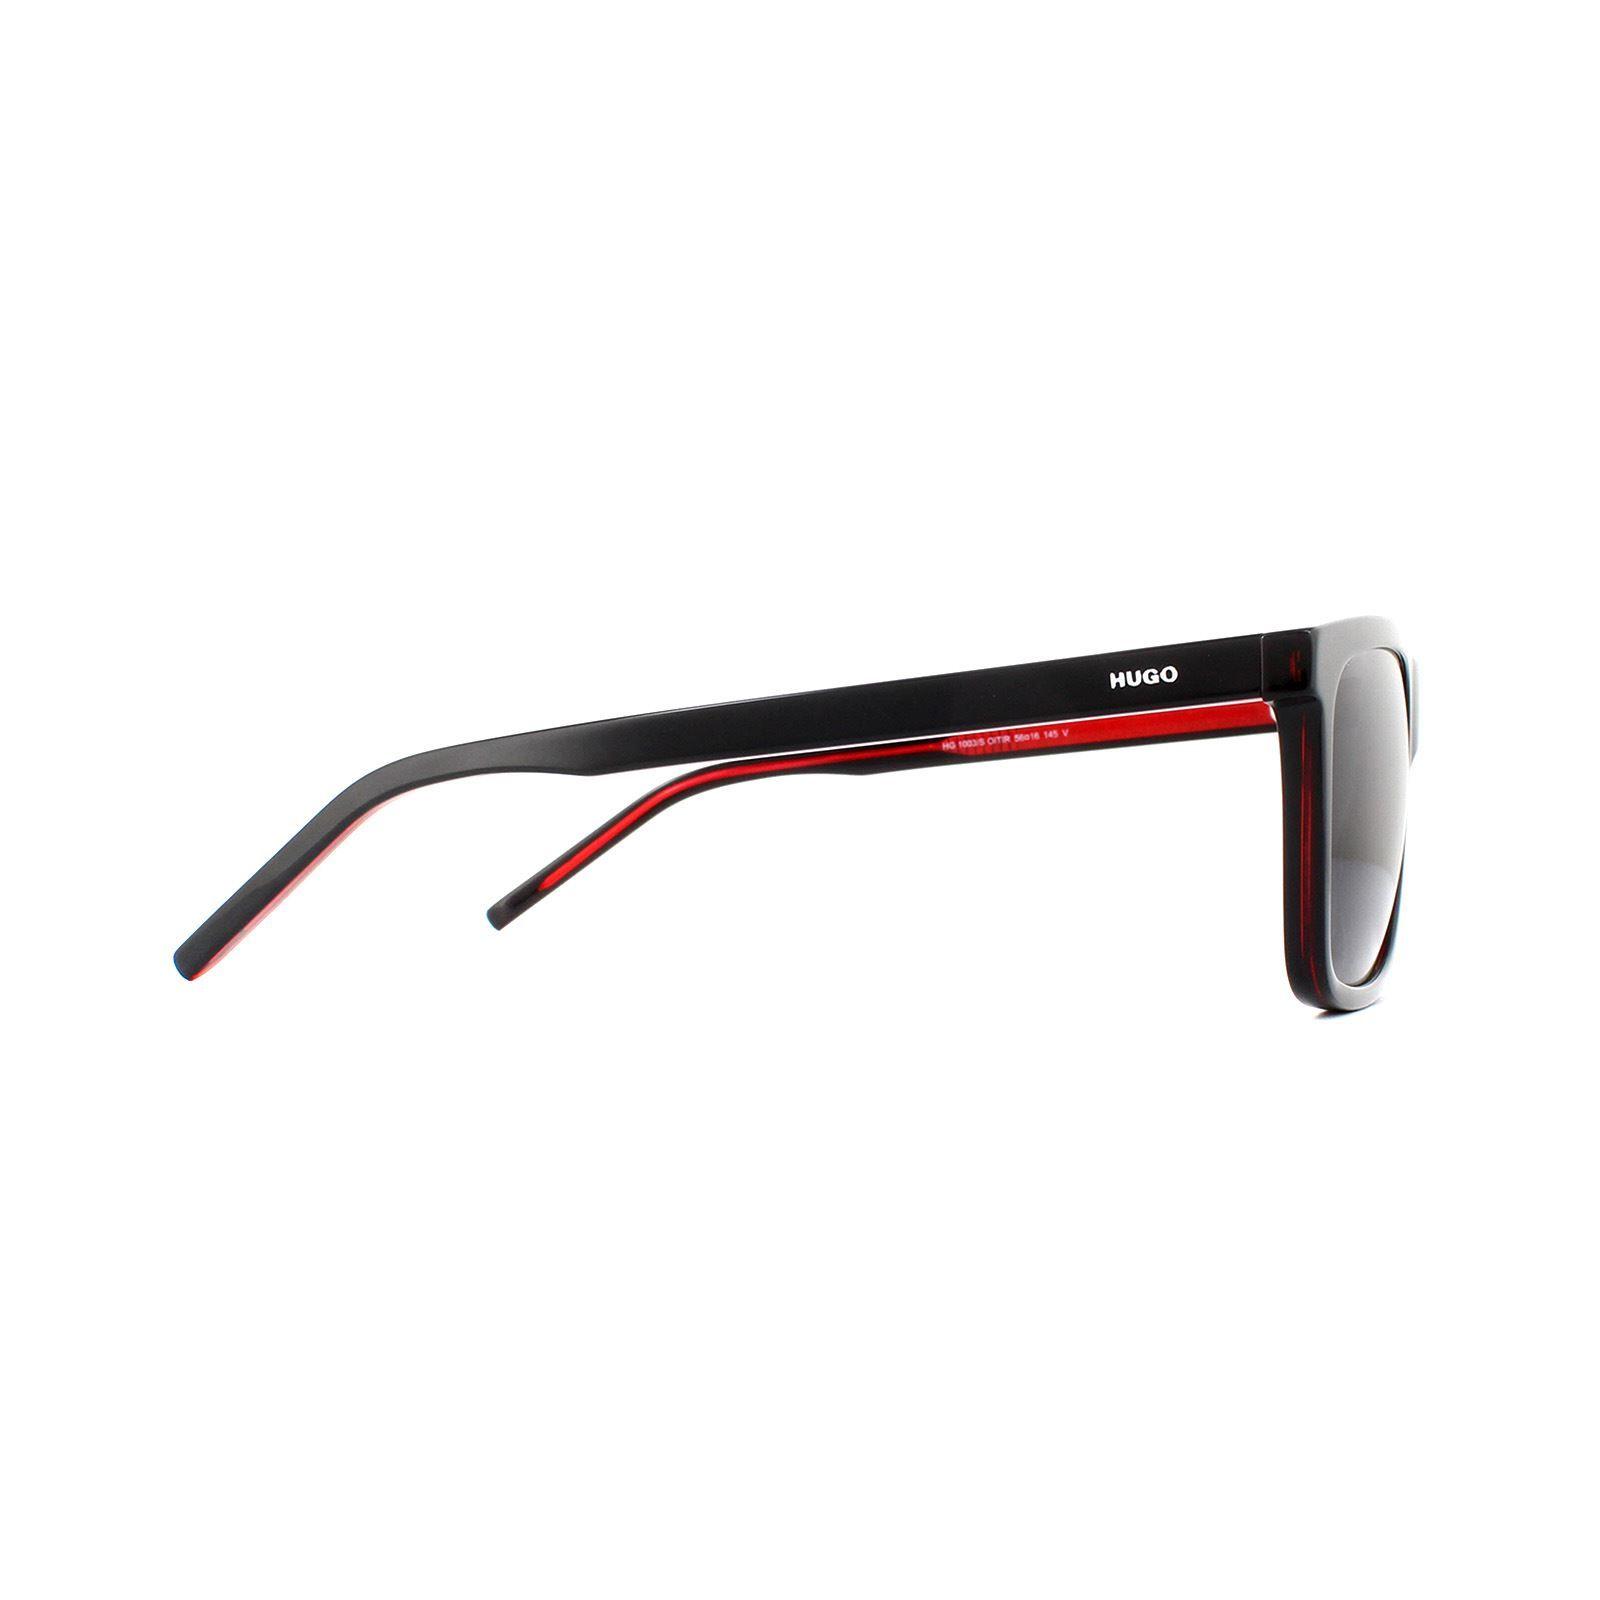 Hugo by Hugo Boss Sunglasses HG 1003/S OIT IR Black Red Grey